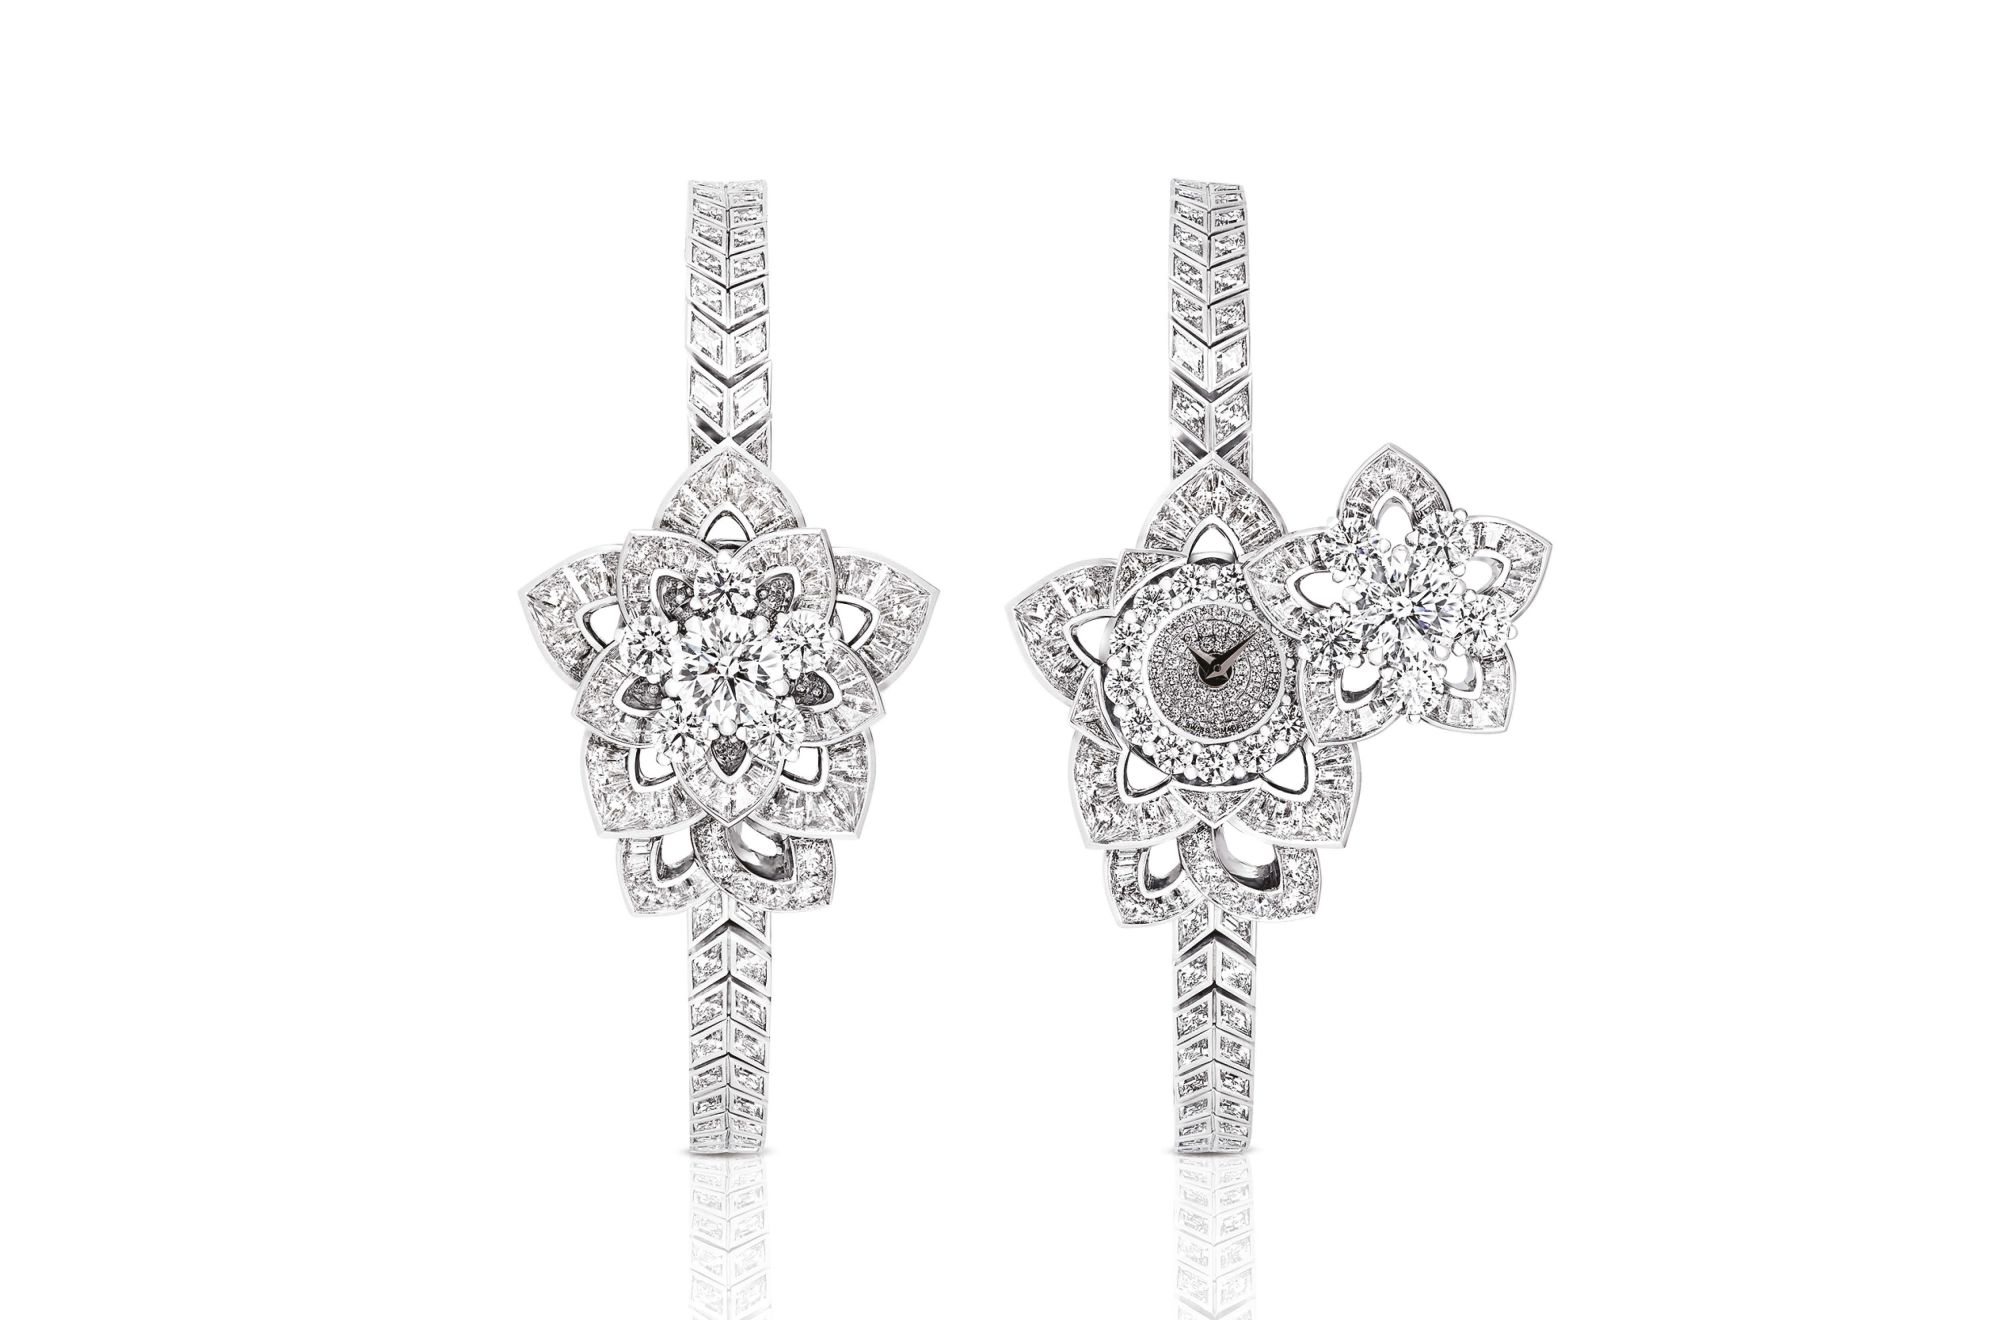 Hidden in Plain Sight: 6 High Jewellery Secret Watches With Beautiful Dials